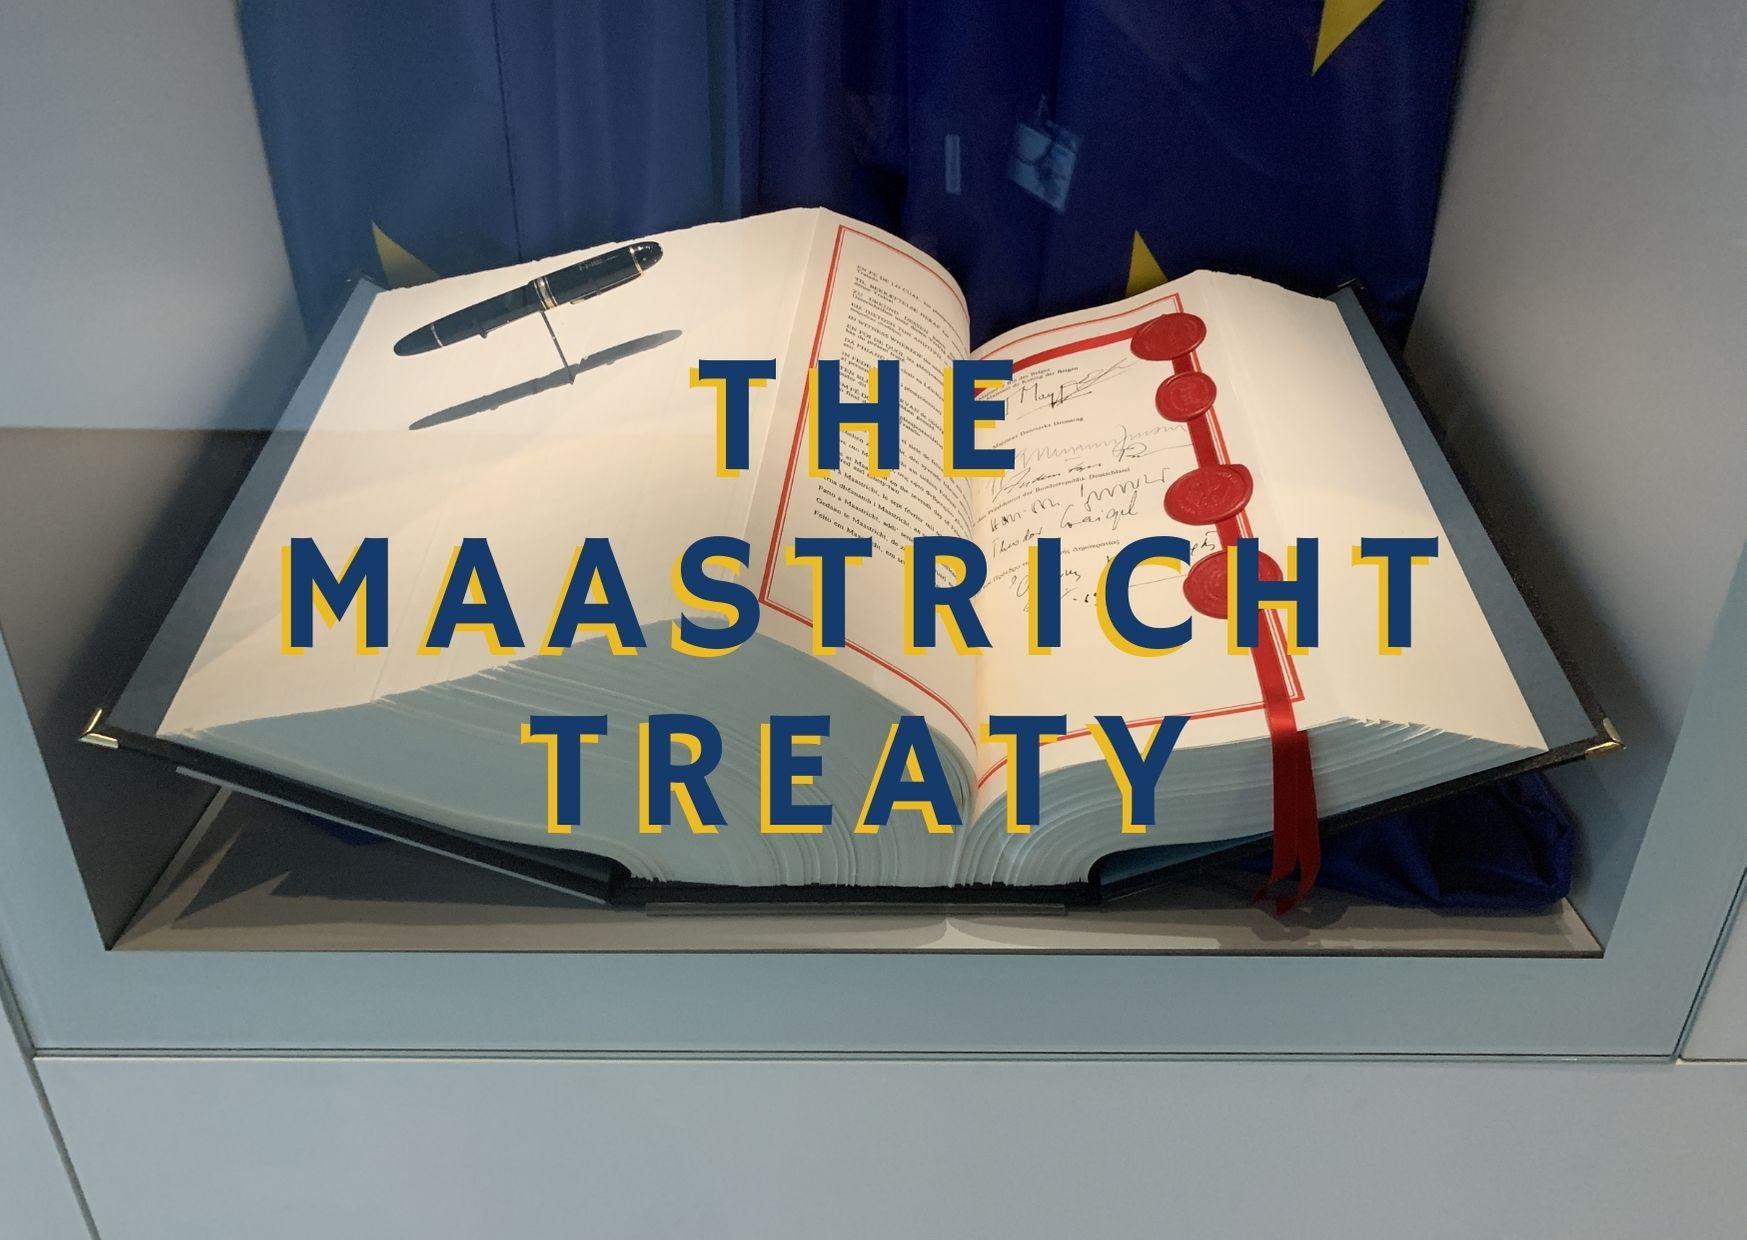 10 g1 en maastricht treaty